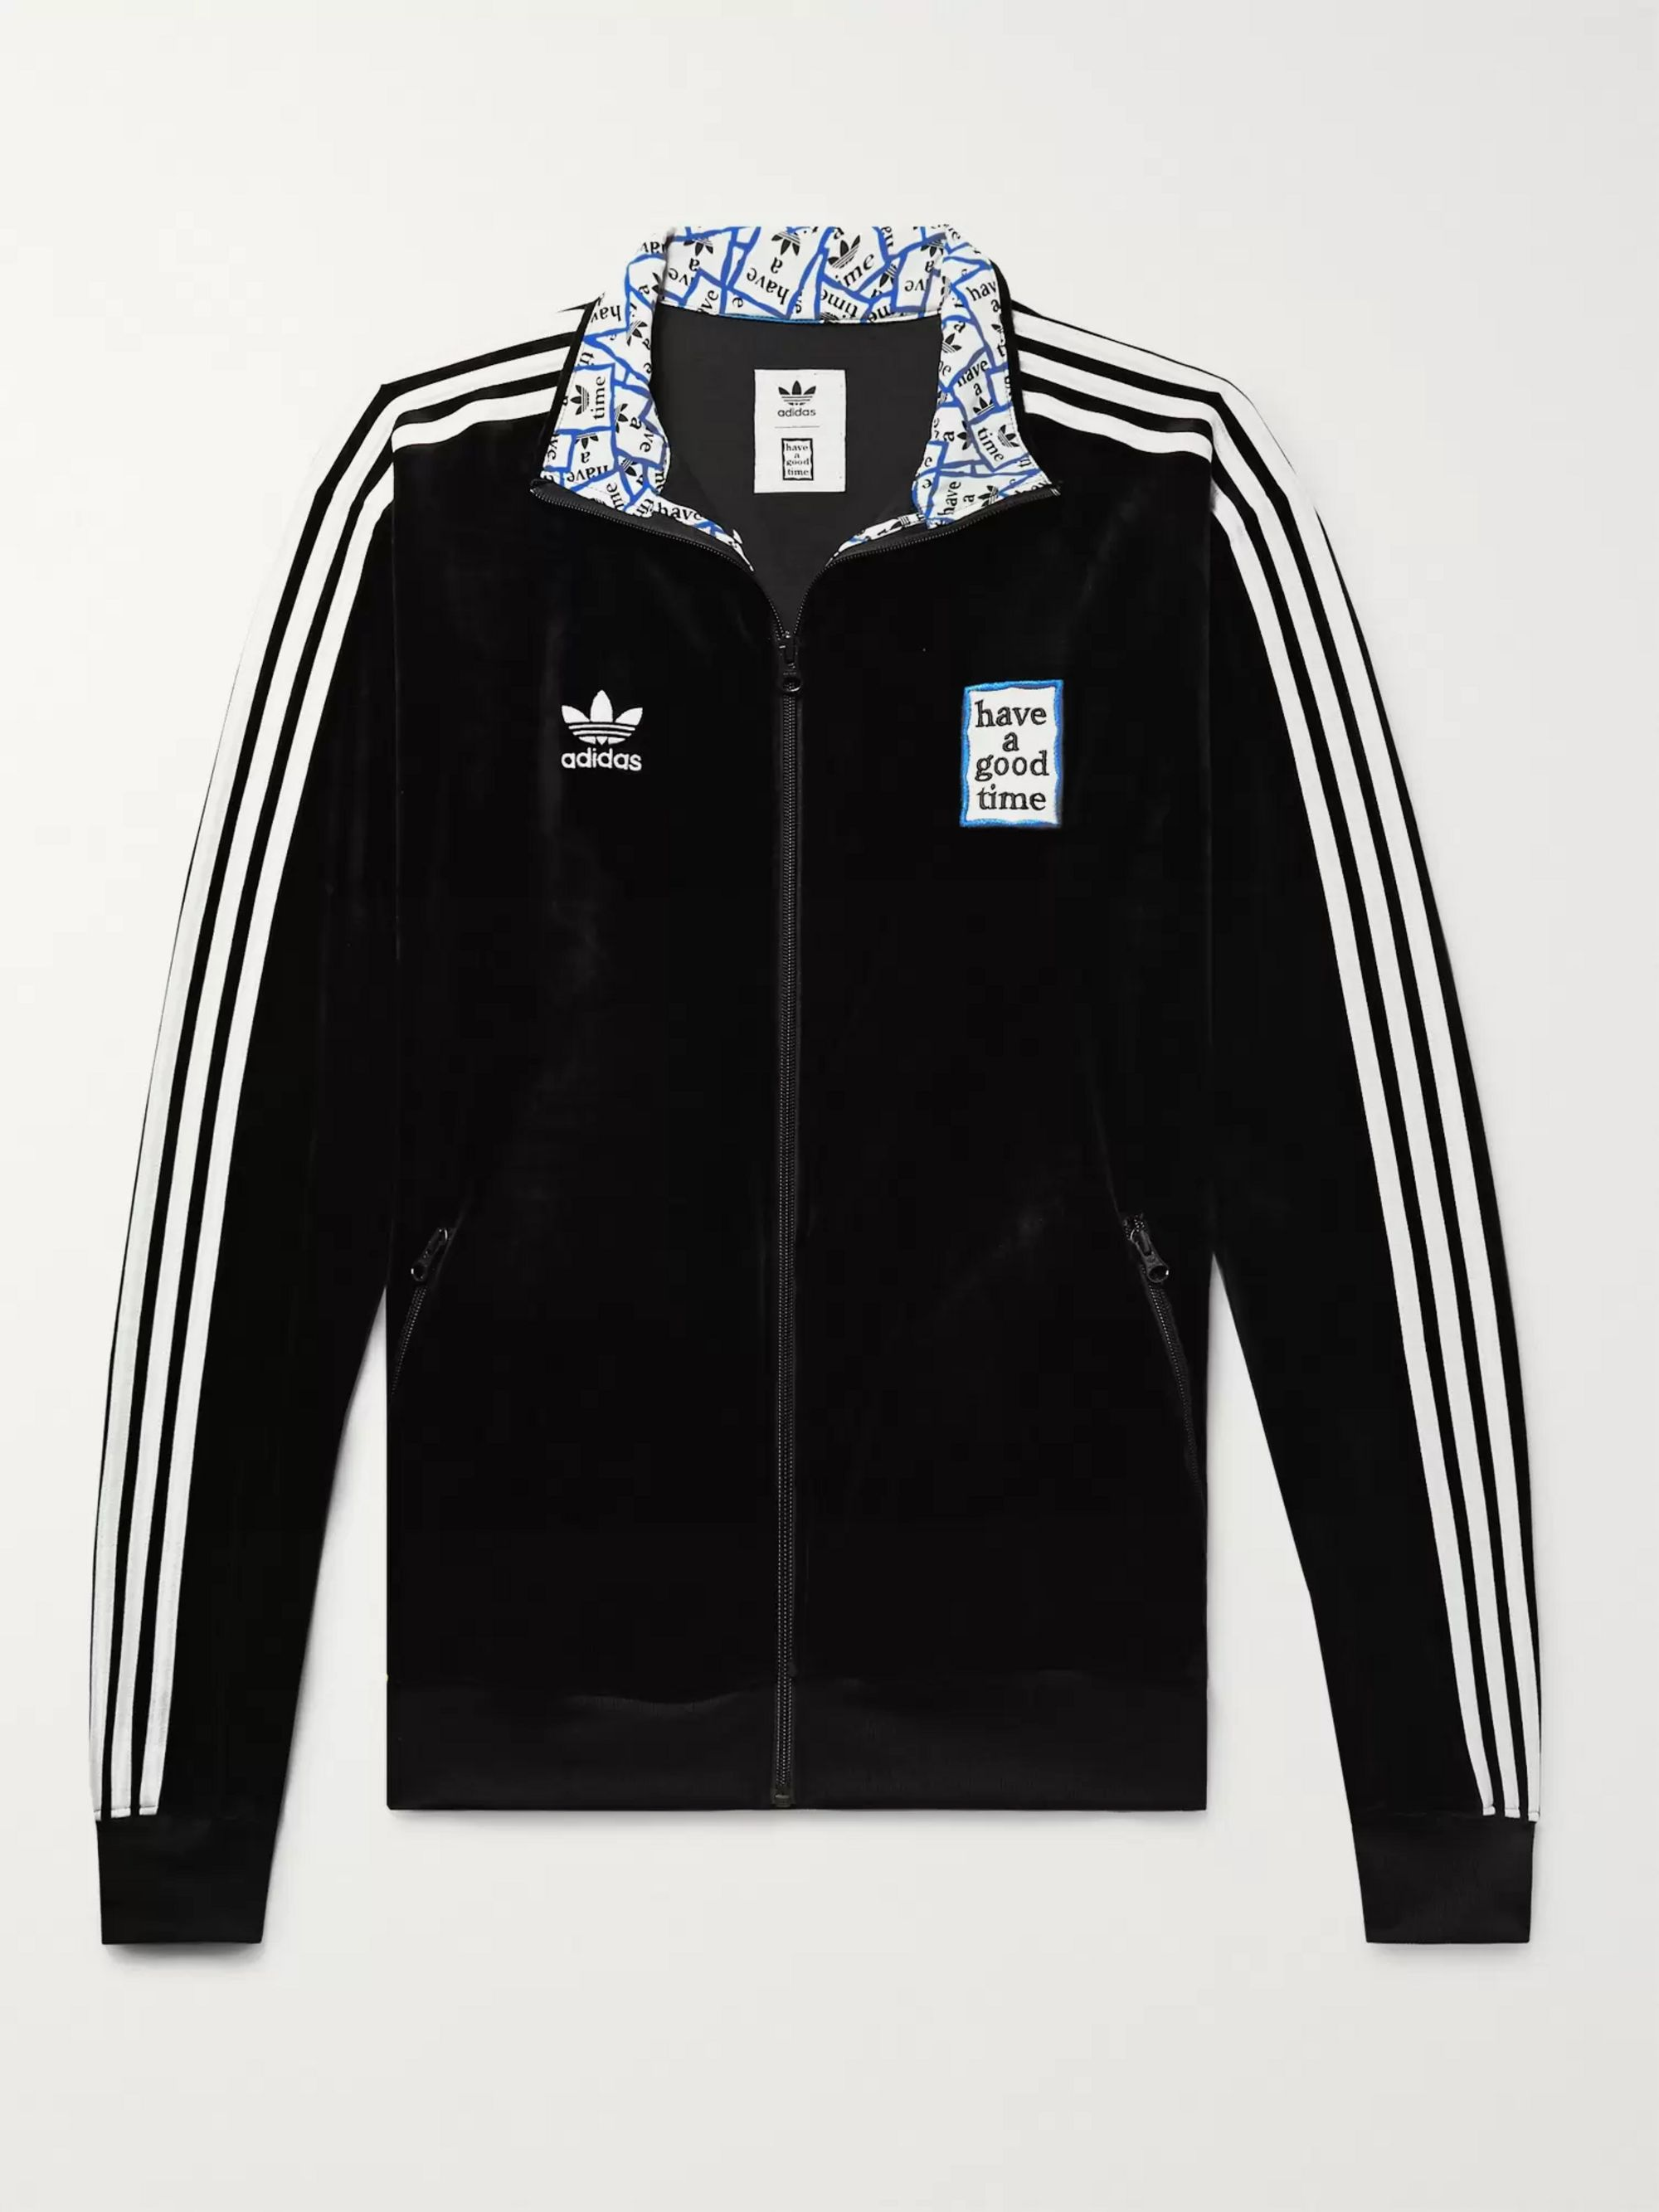 Shop Men's Adidas Tracksuit Jackets up to 80% Off | DealDoodle